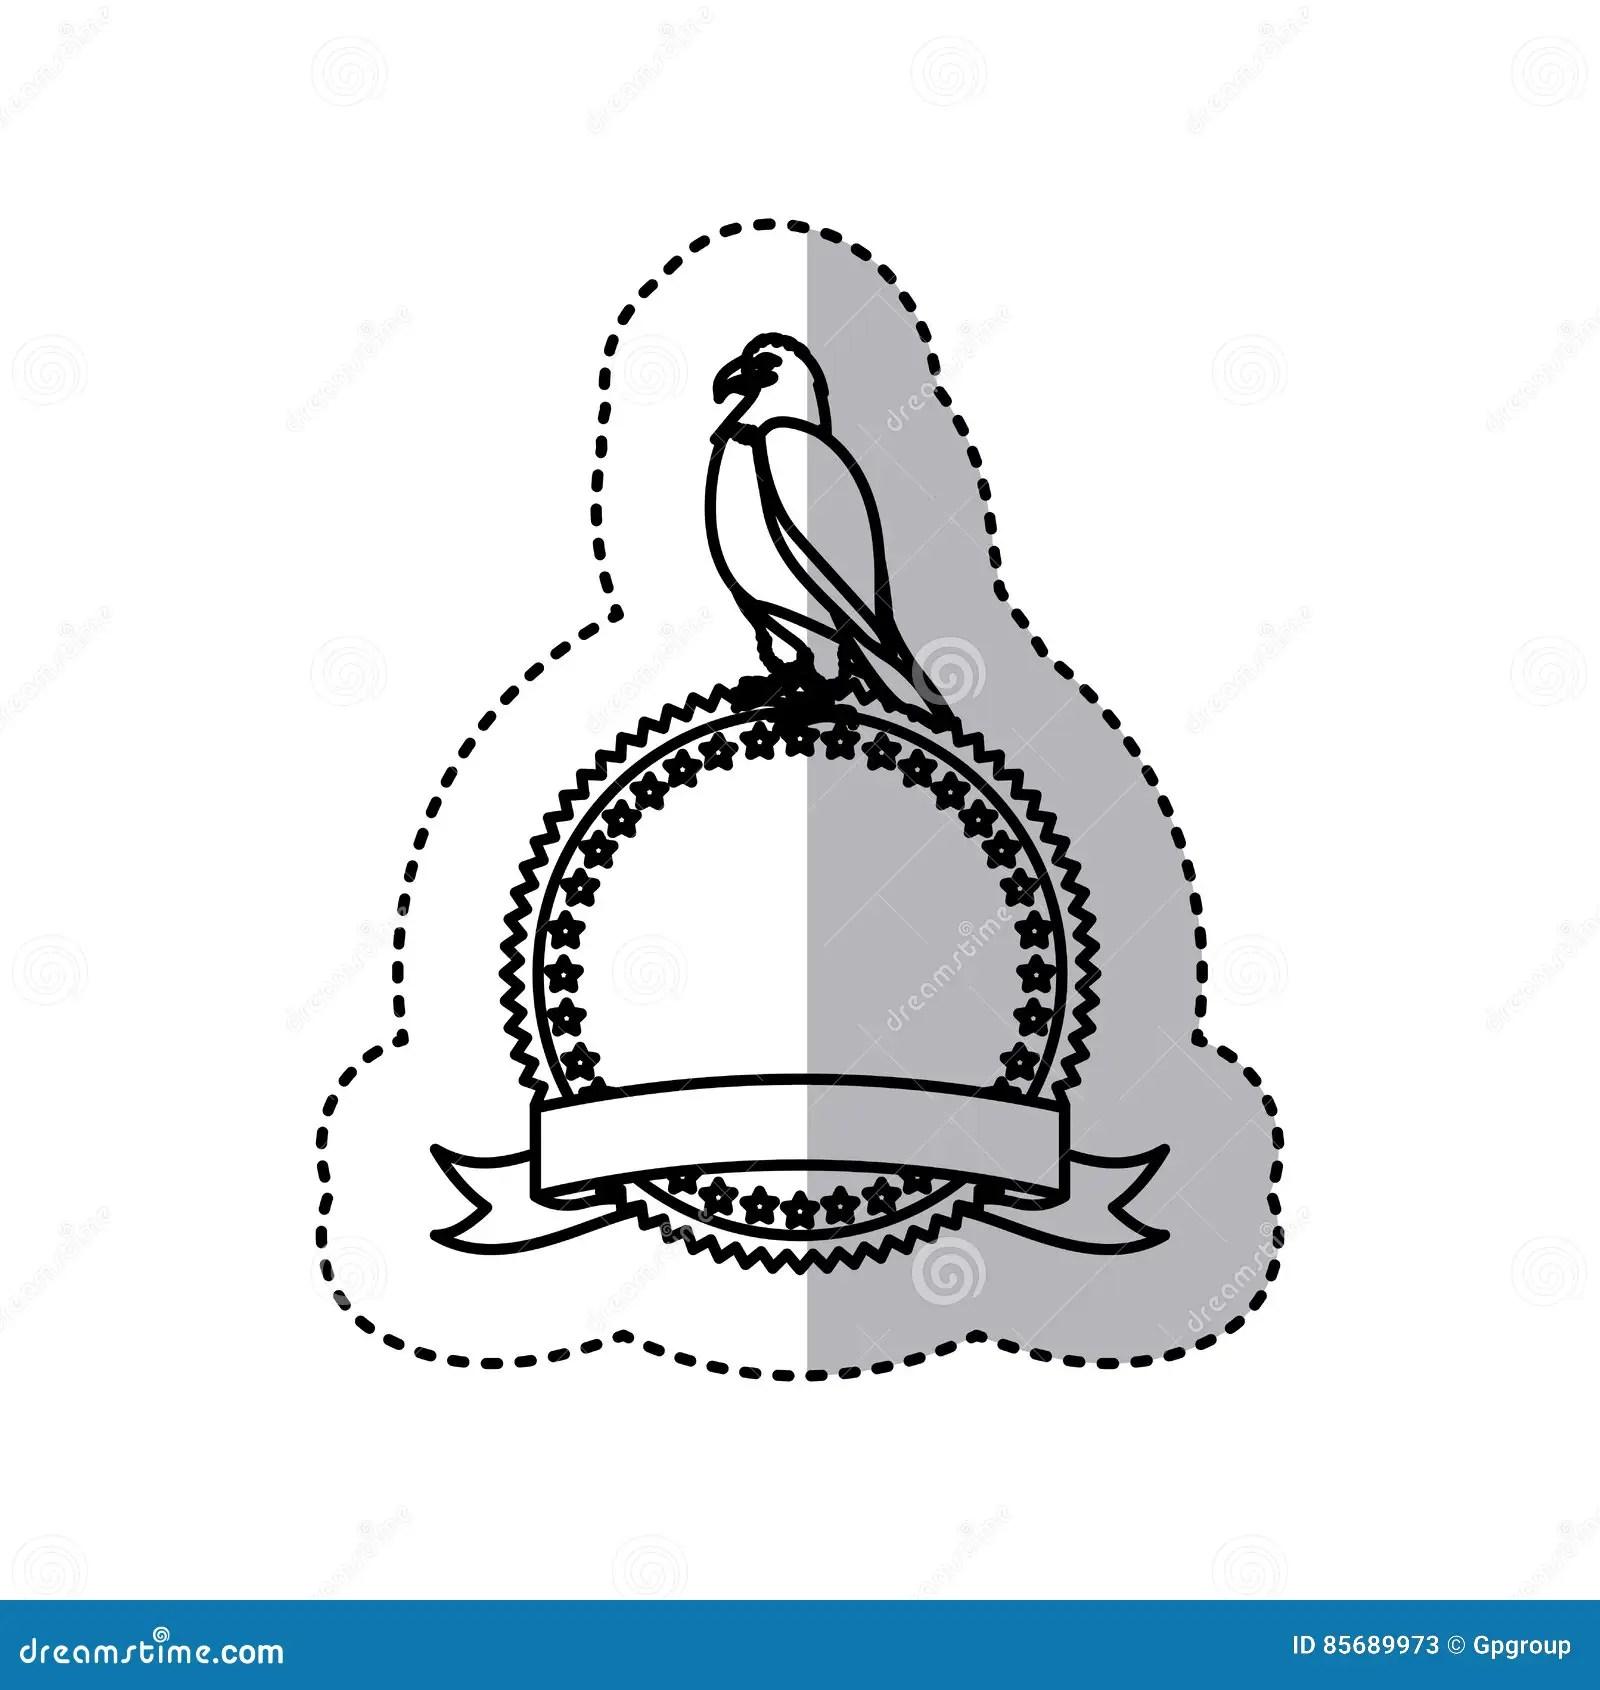 Bald Eagle, US National Emblem Royalty-Free Stock